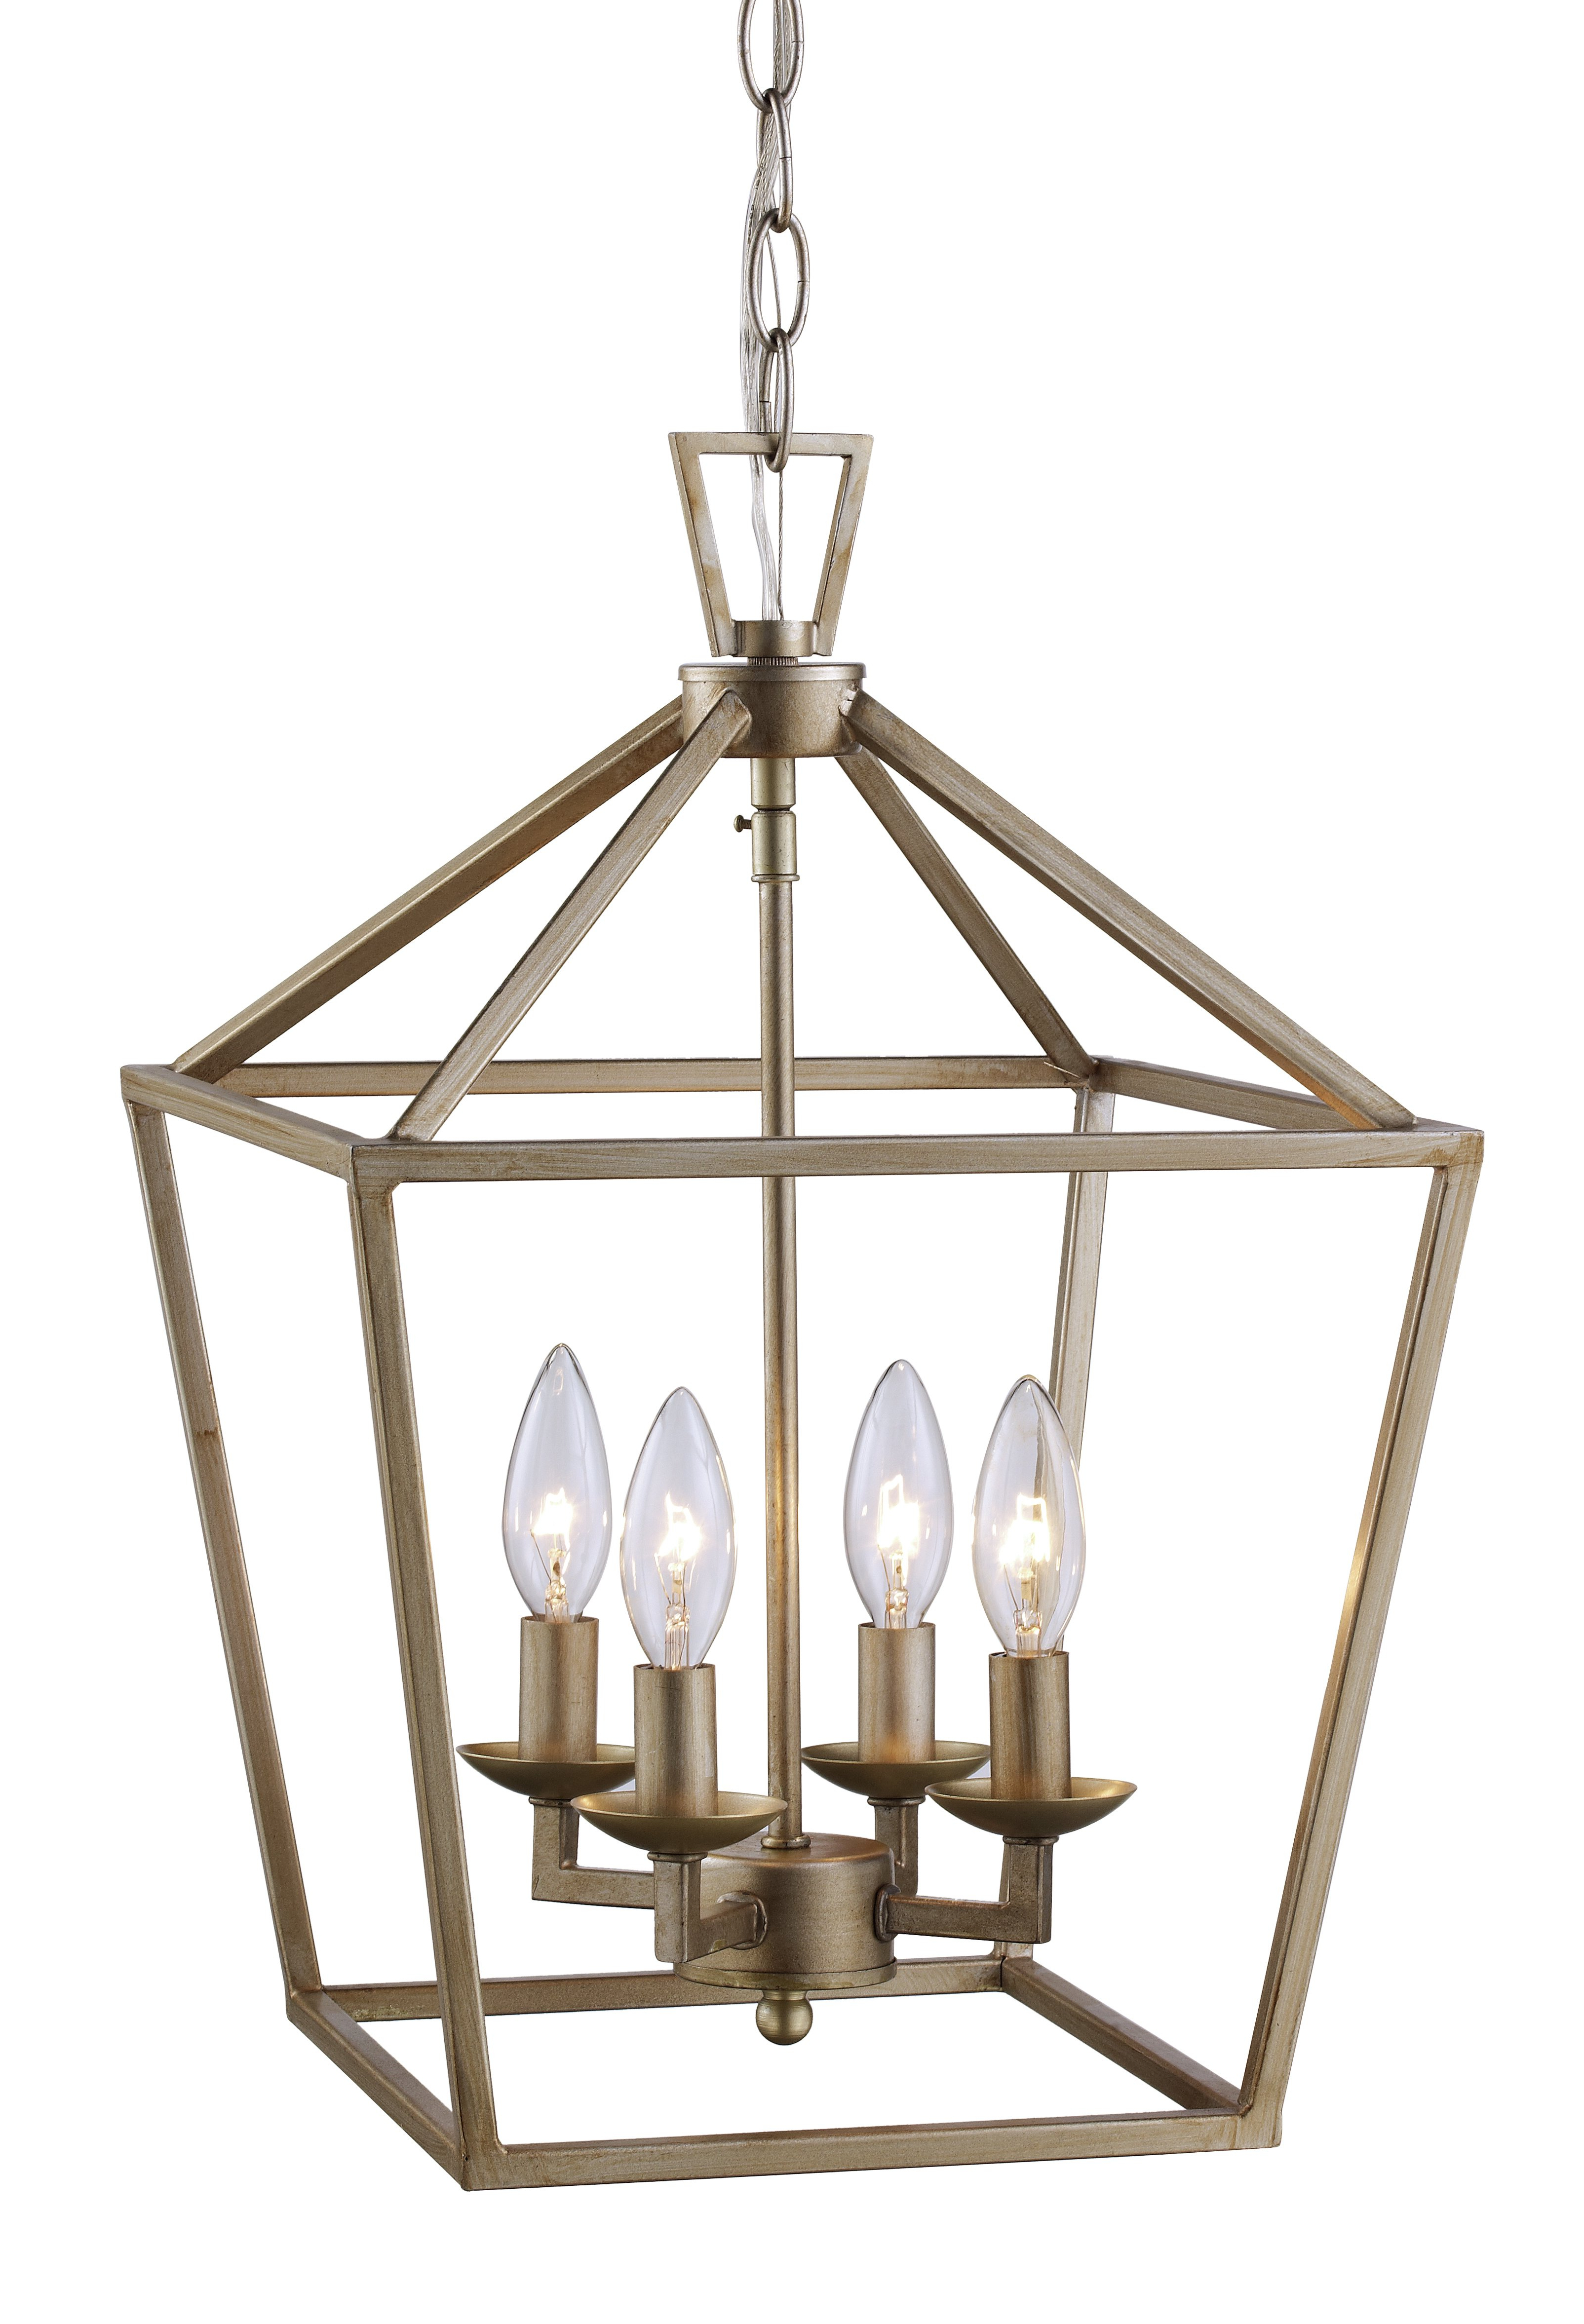 Varnum 4 Light Lantern Pendants With Regard To Newest Carmen 4 Light Lantern Pendant (View 18 of 20)